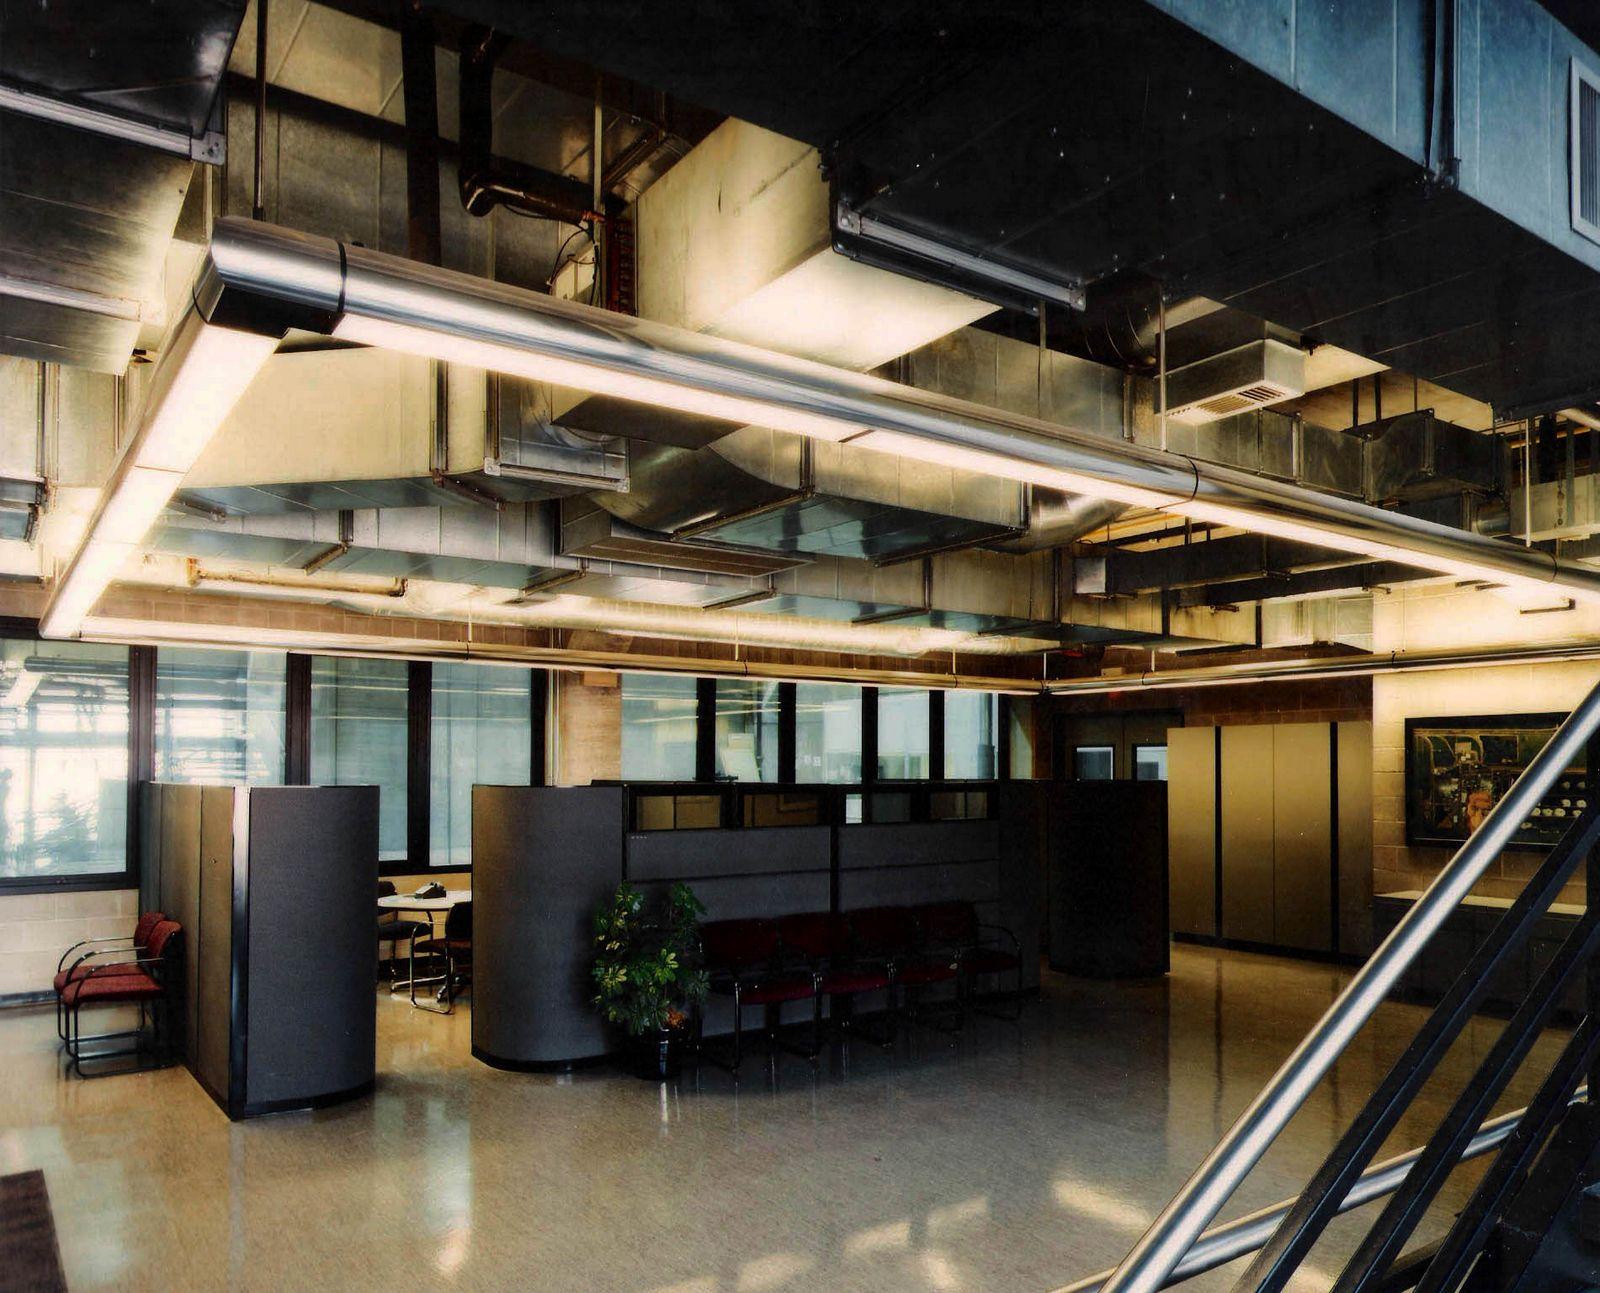 Jim oliver 39 s architectural interior design images for Interior architecture